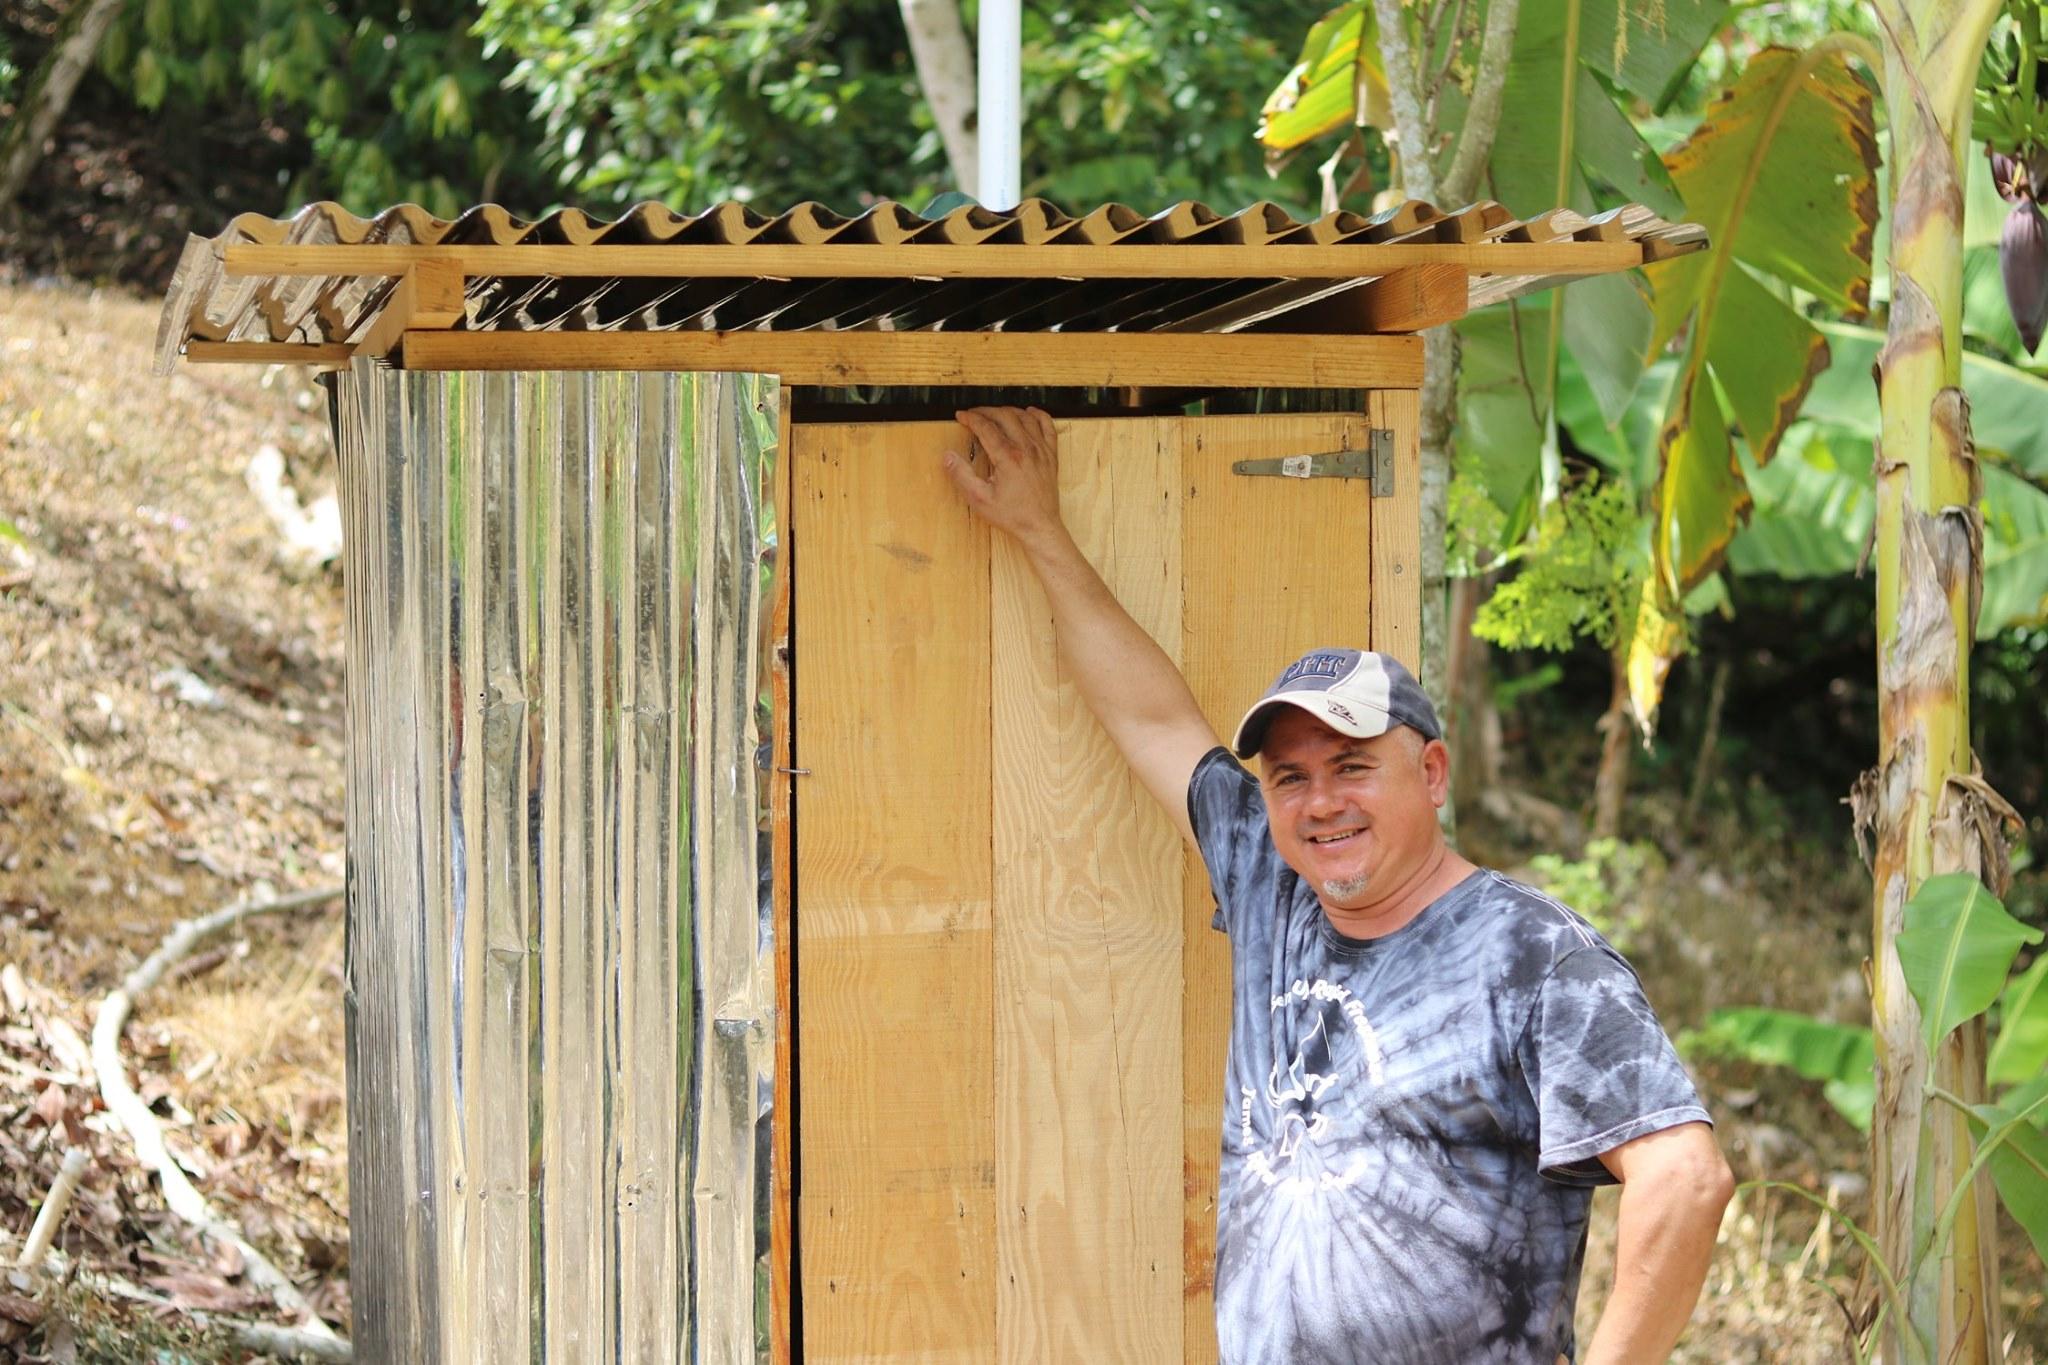 blue-missions-volunteer-posing-next-to-latrine.jpg